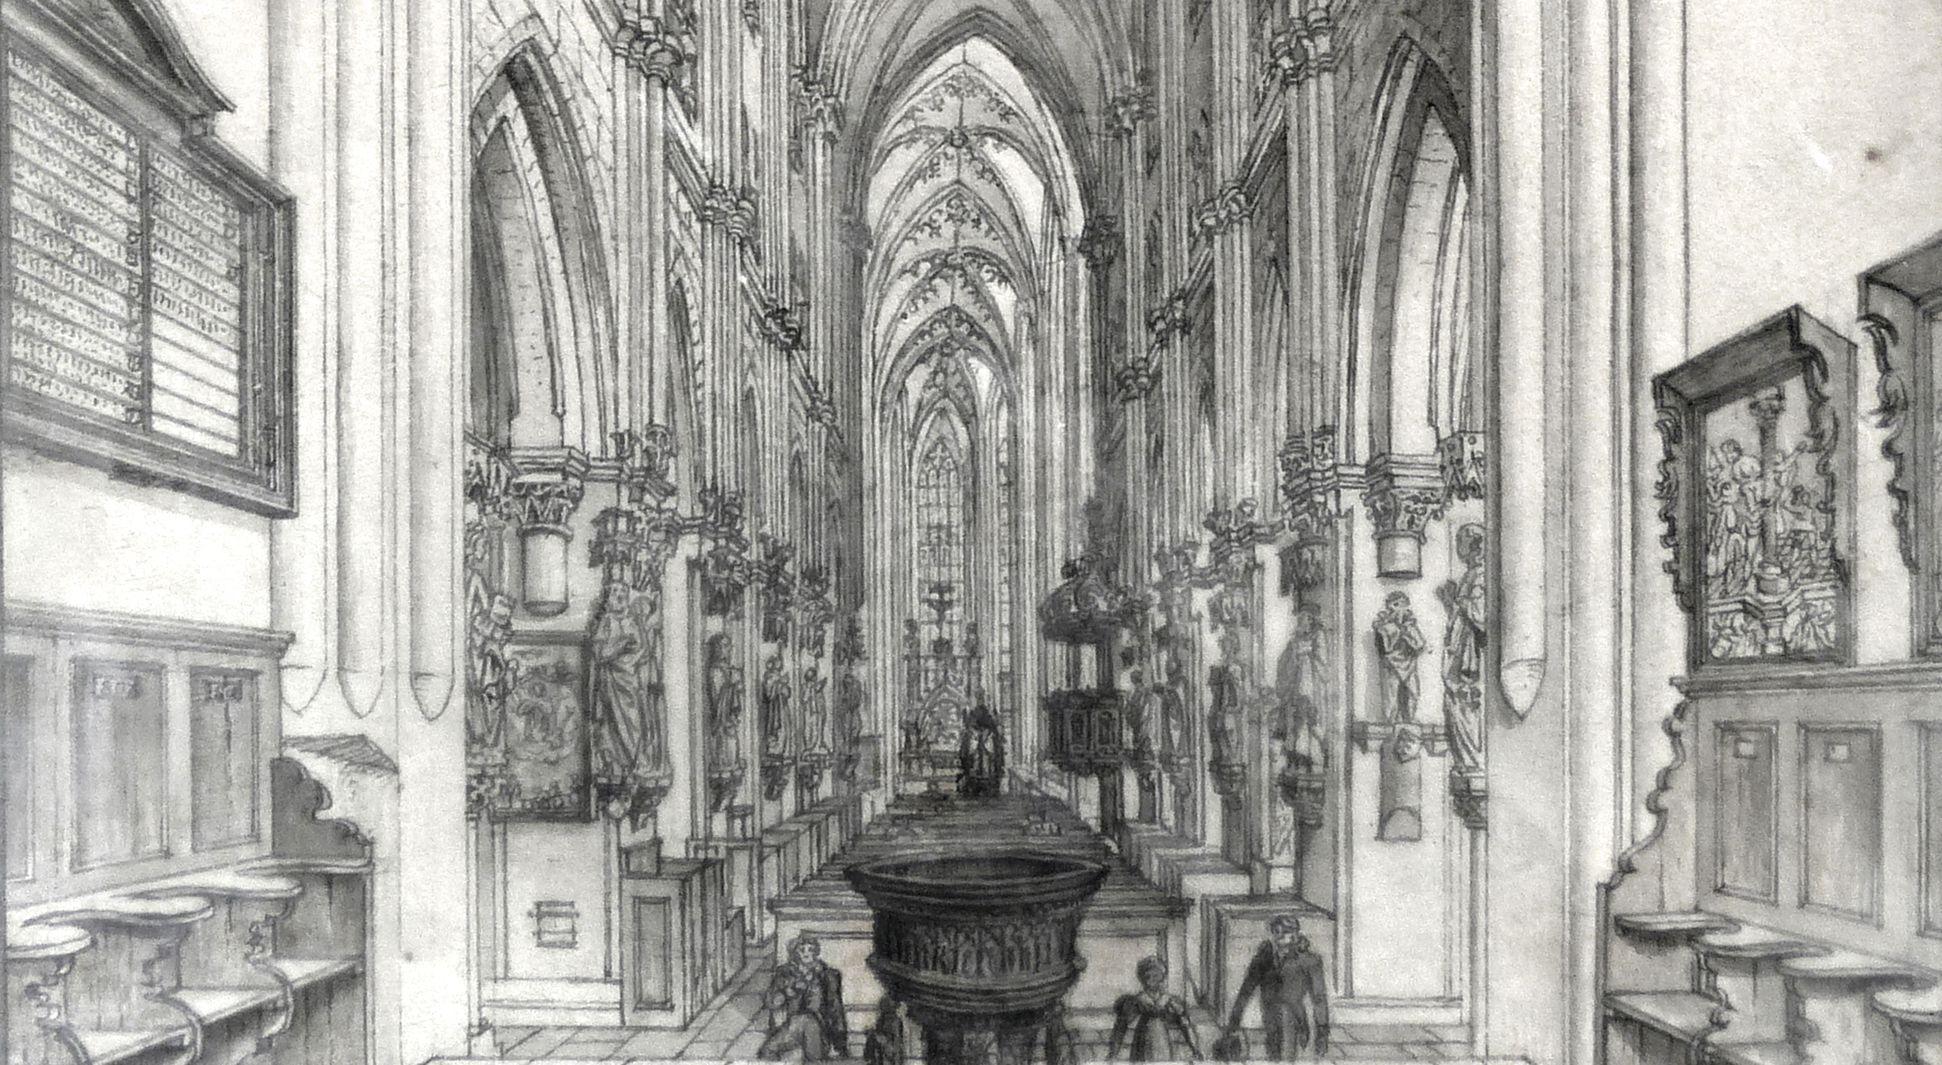 Das Innere der Sebaldskirche zu Nürnberg unterer Bildausschnitt